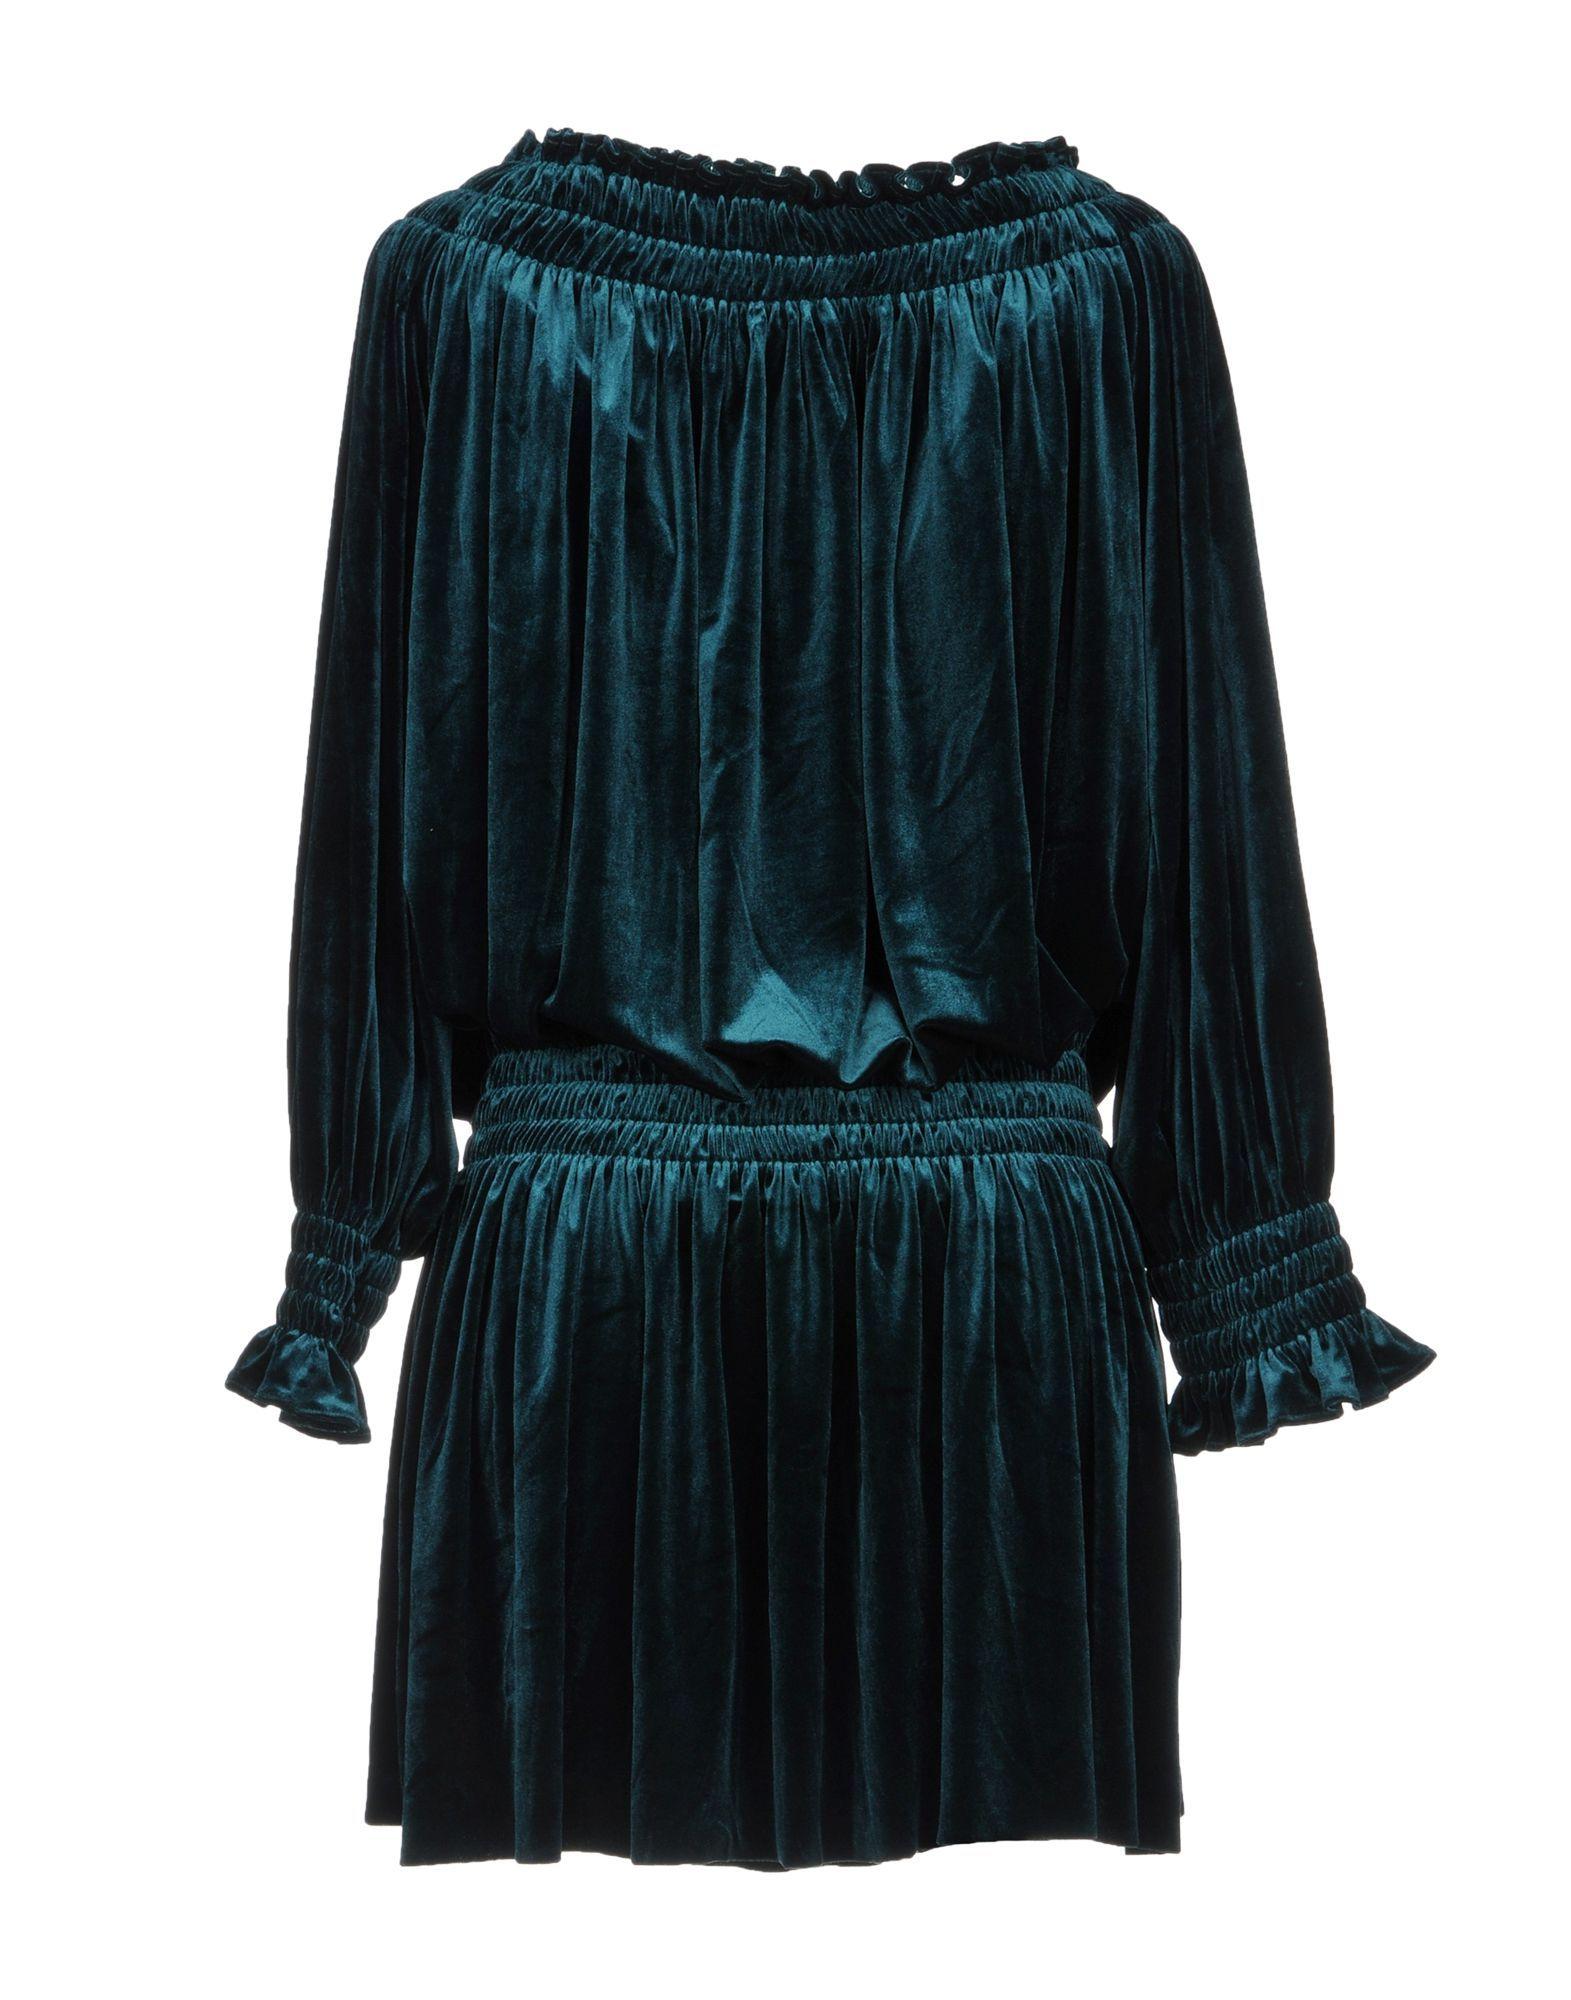 Norma Kamali Green Long Sleeve Dress